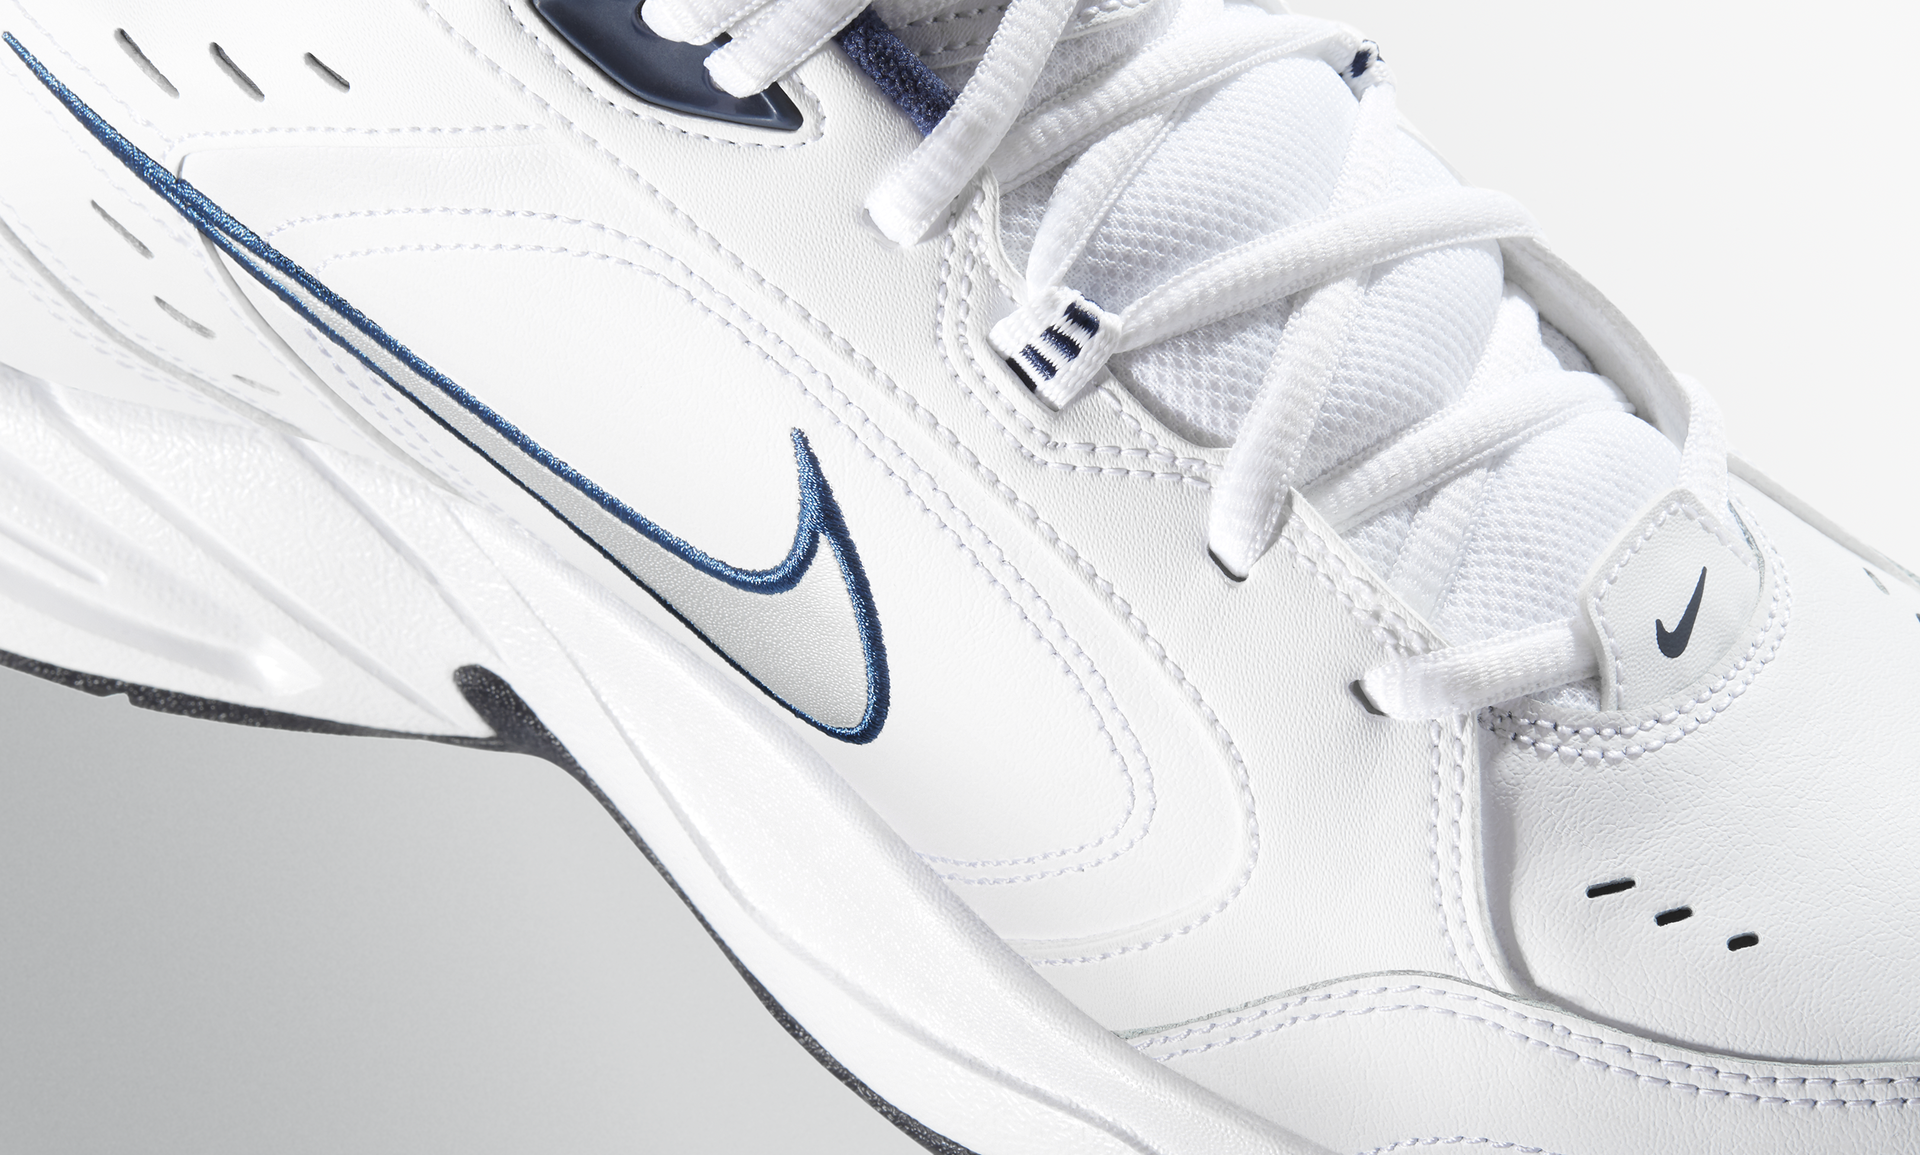 Nike Air Max Nike Free Schnürsenkel Nike png herunterladen